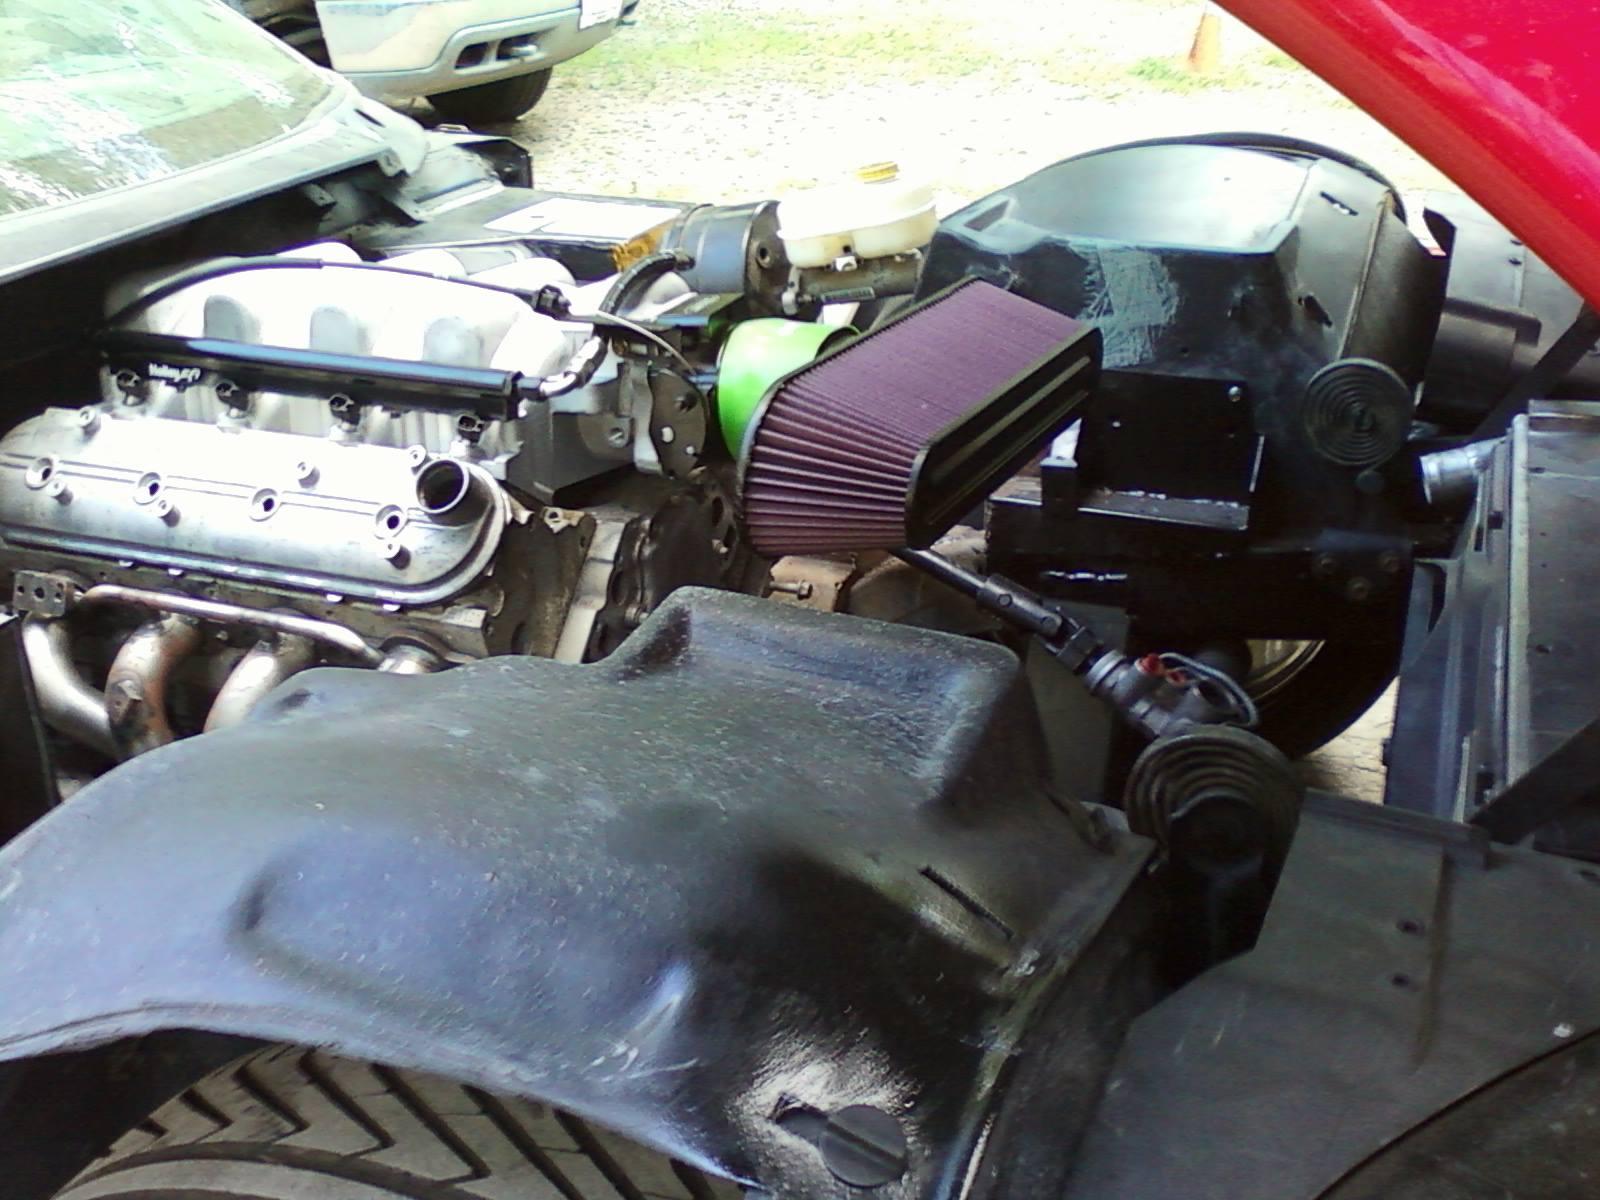 rebuilding a dodge viper with a chevy v8 engine swap depot rh engineswapdepot com viper engine swap charger viper engine swap challenger